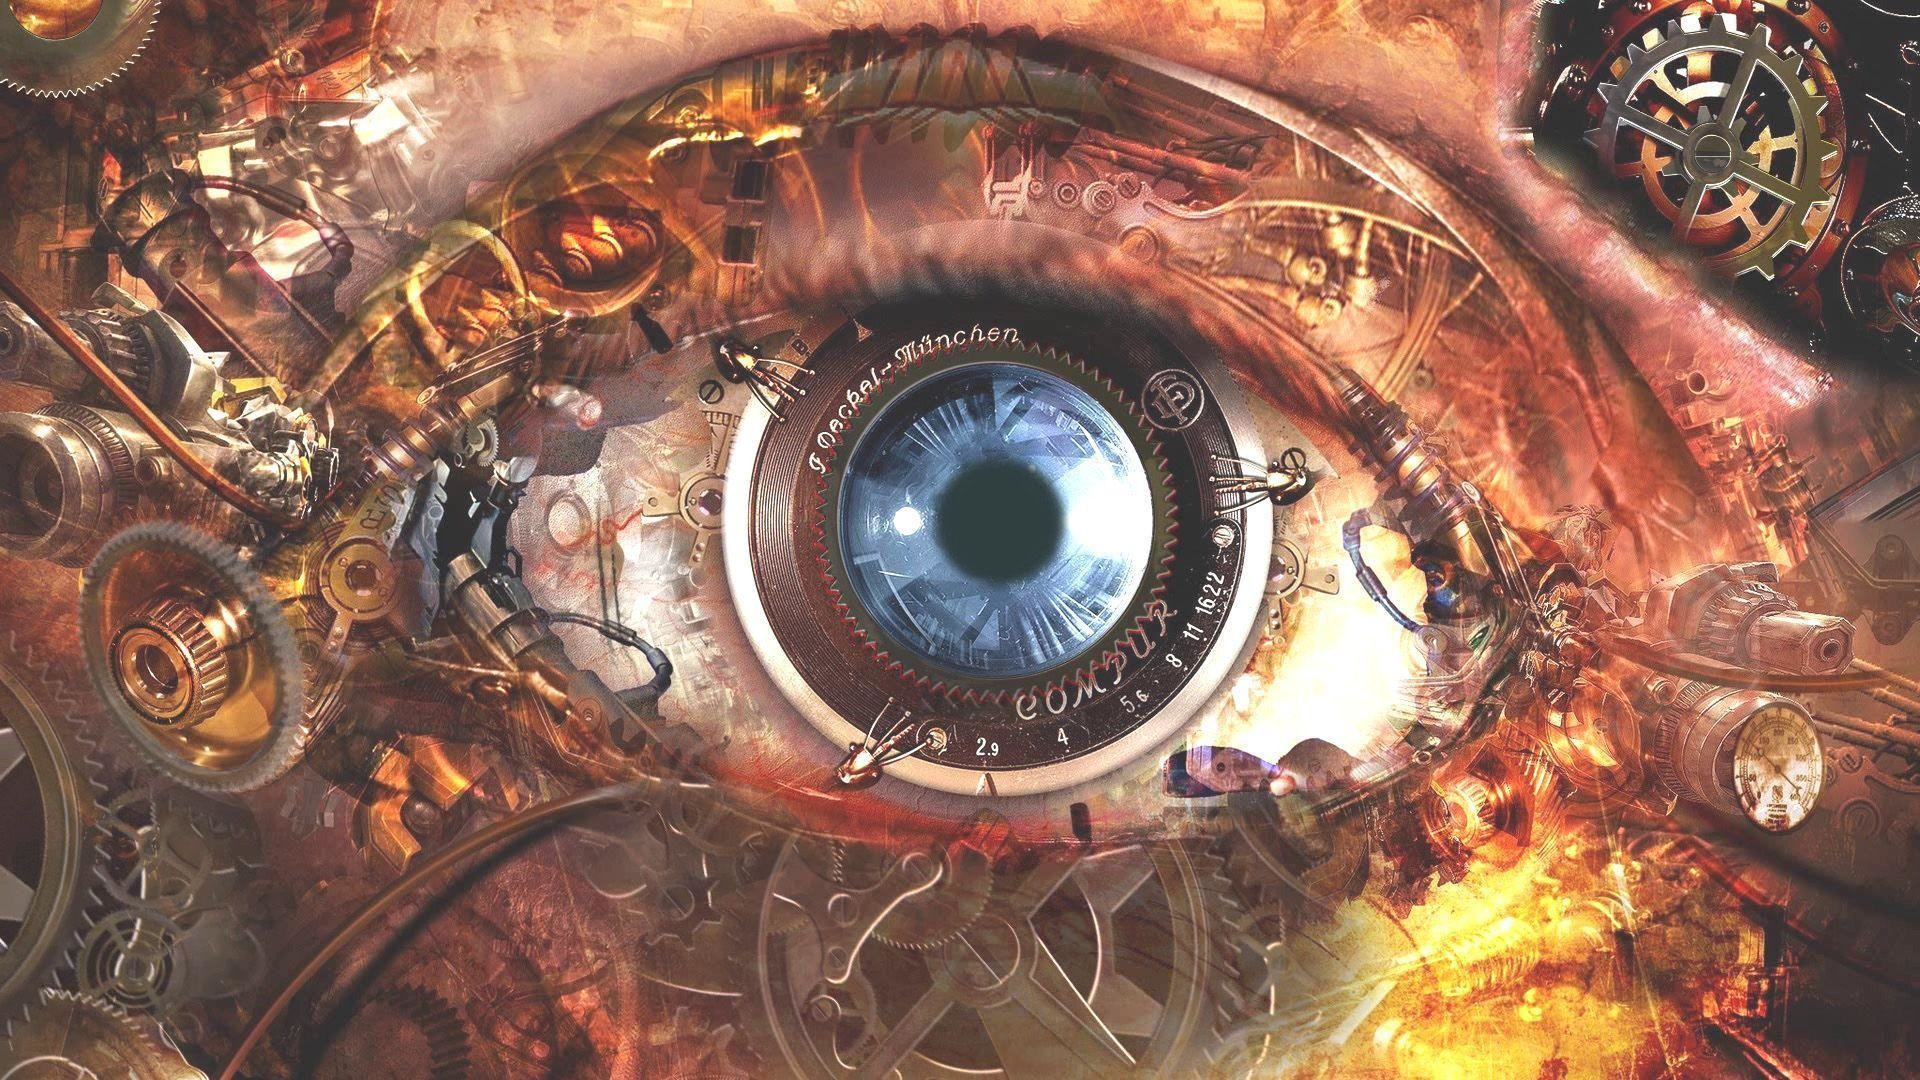 Wallpapers Backgrounds Quantum Mechanics | edumacation | Pinterest .